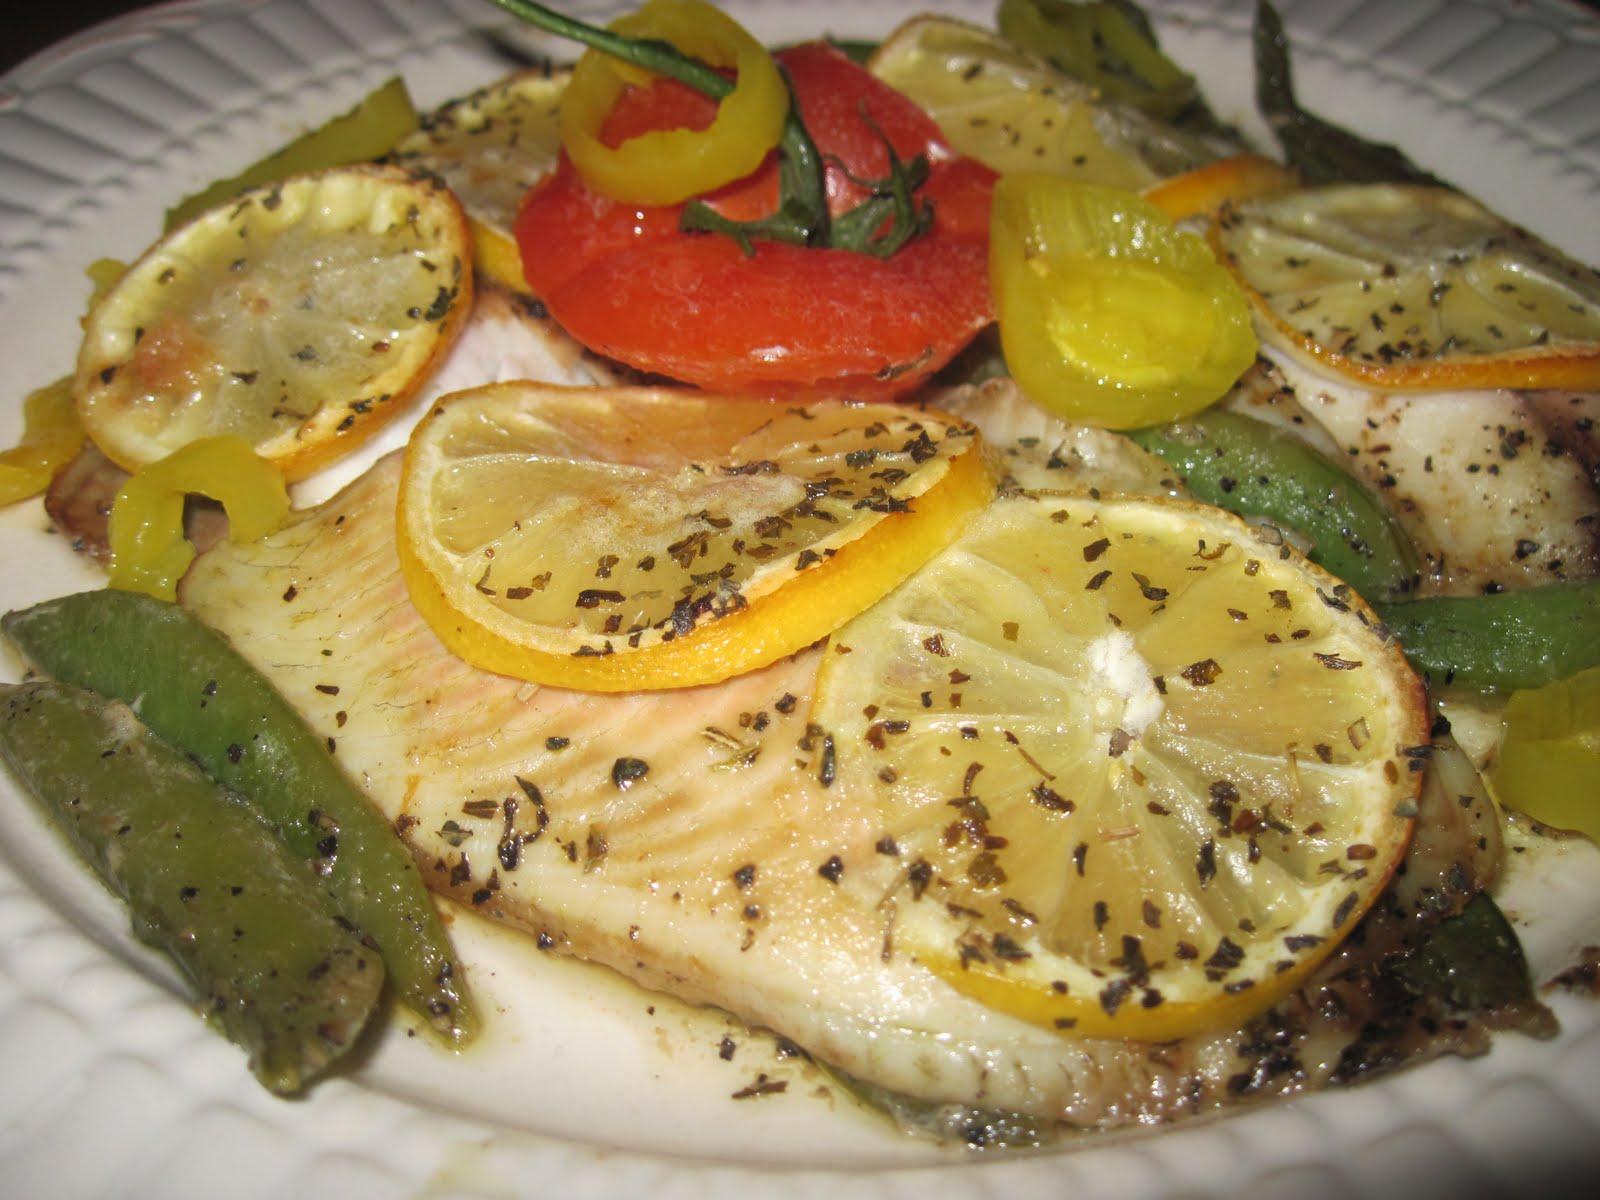 Islandwood recipes baked tilapia de islandwood for Recipes for tilapia fish